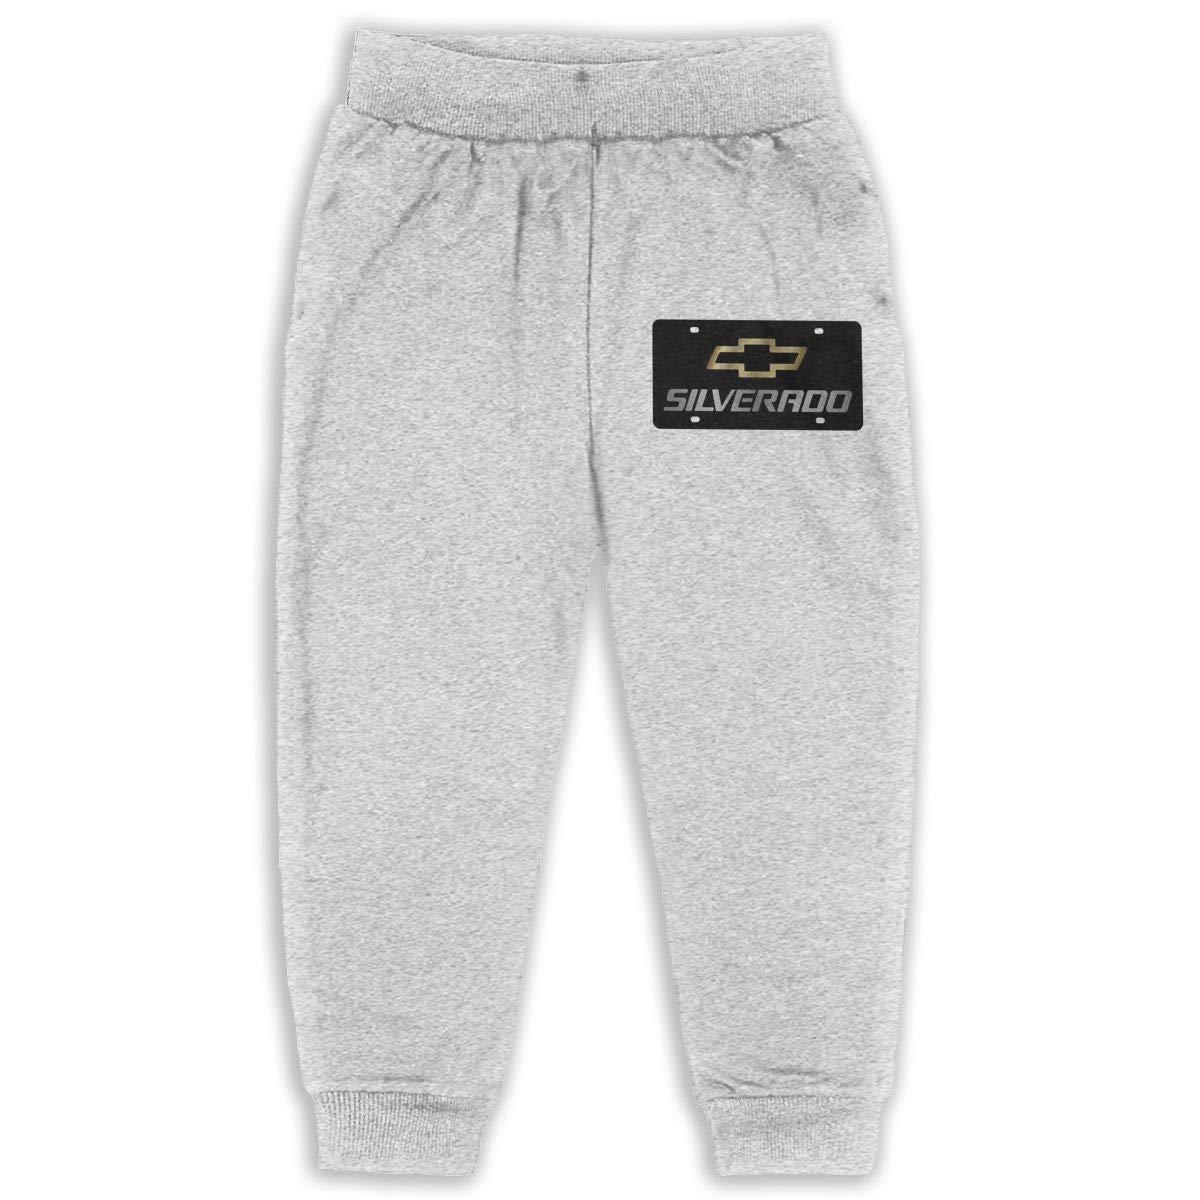 Childrens Sweatpants Chevrolet Silverado Logo Boys and Girls Jogger Long Pants Sweatpants Leggings